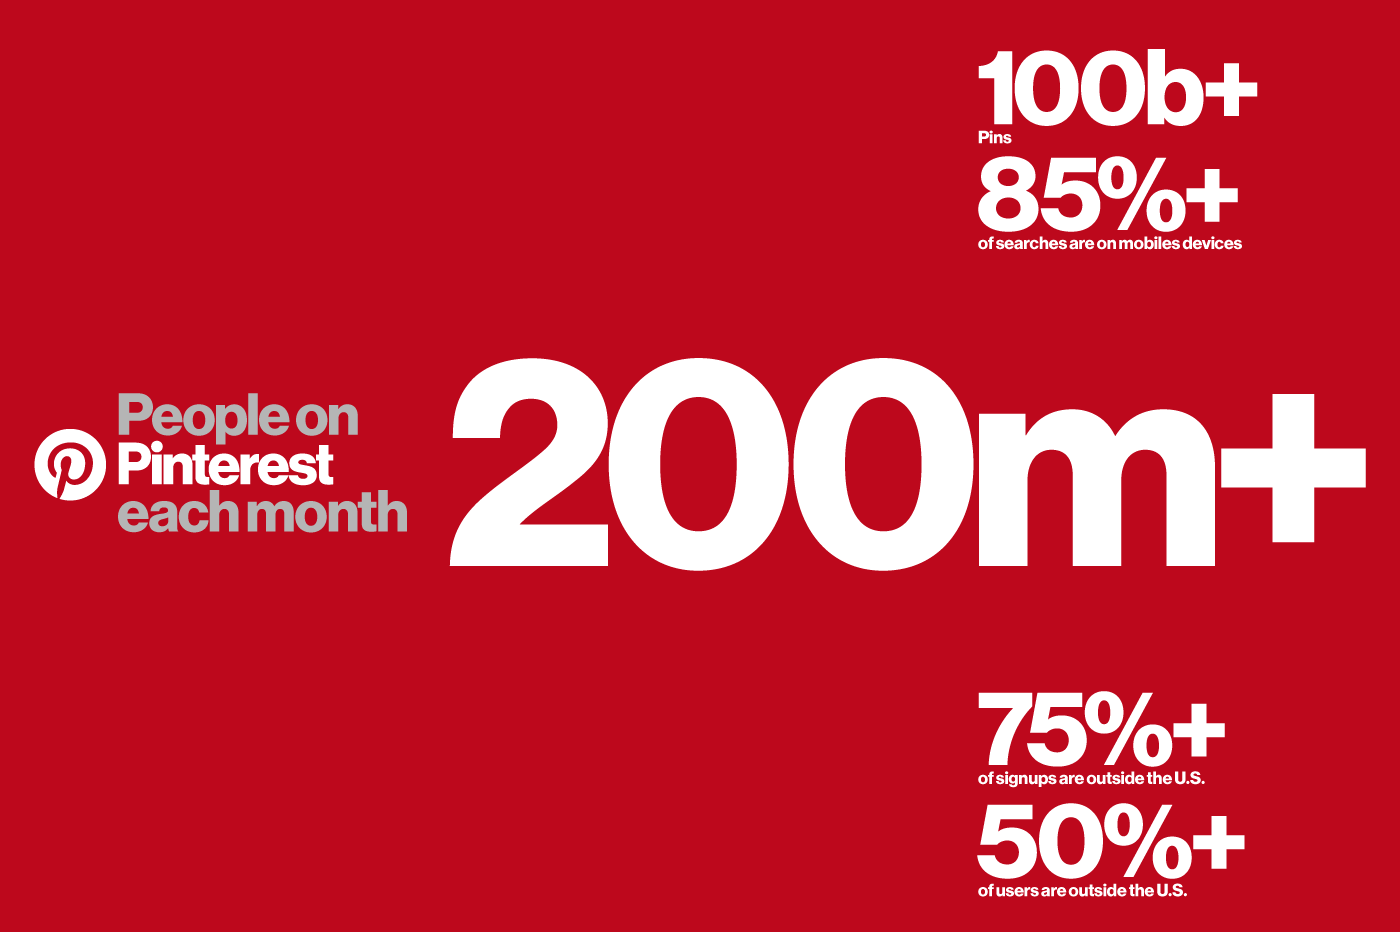 Pinterest Celebrating 200 Million People